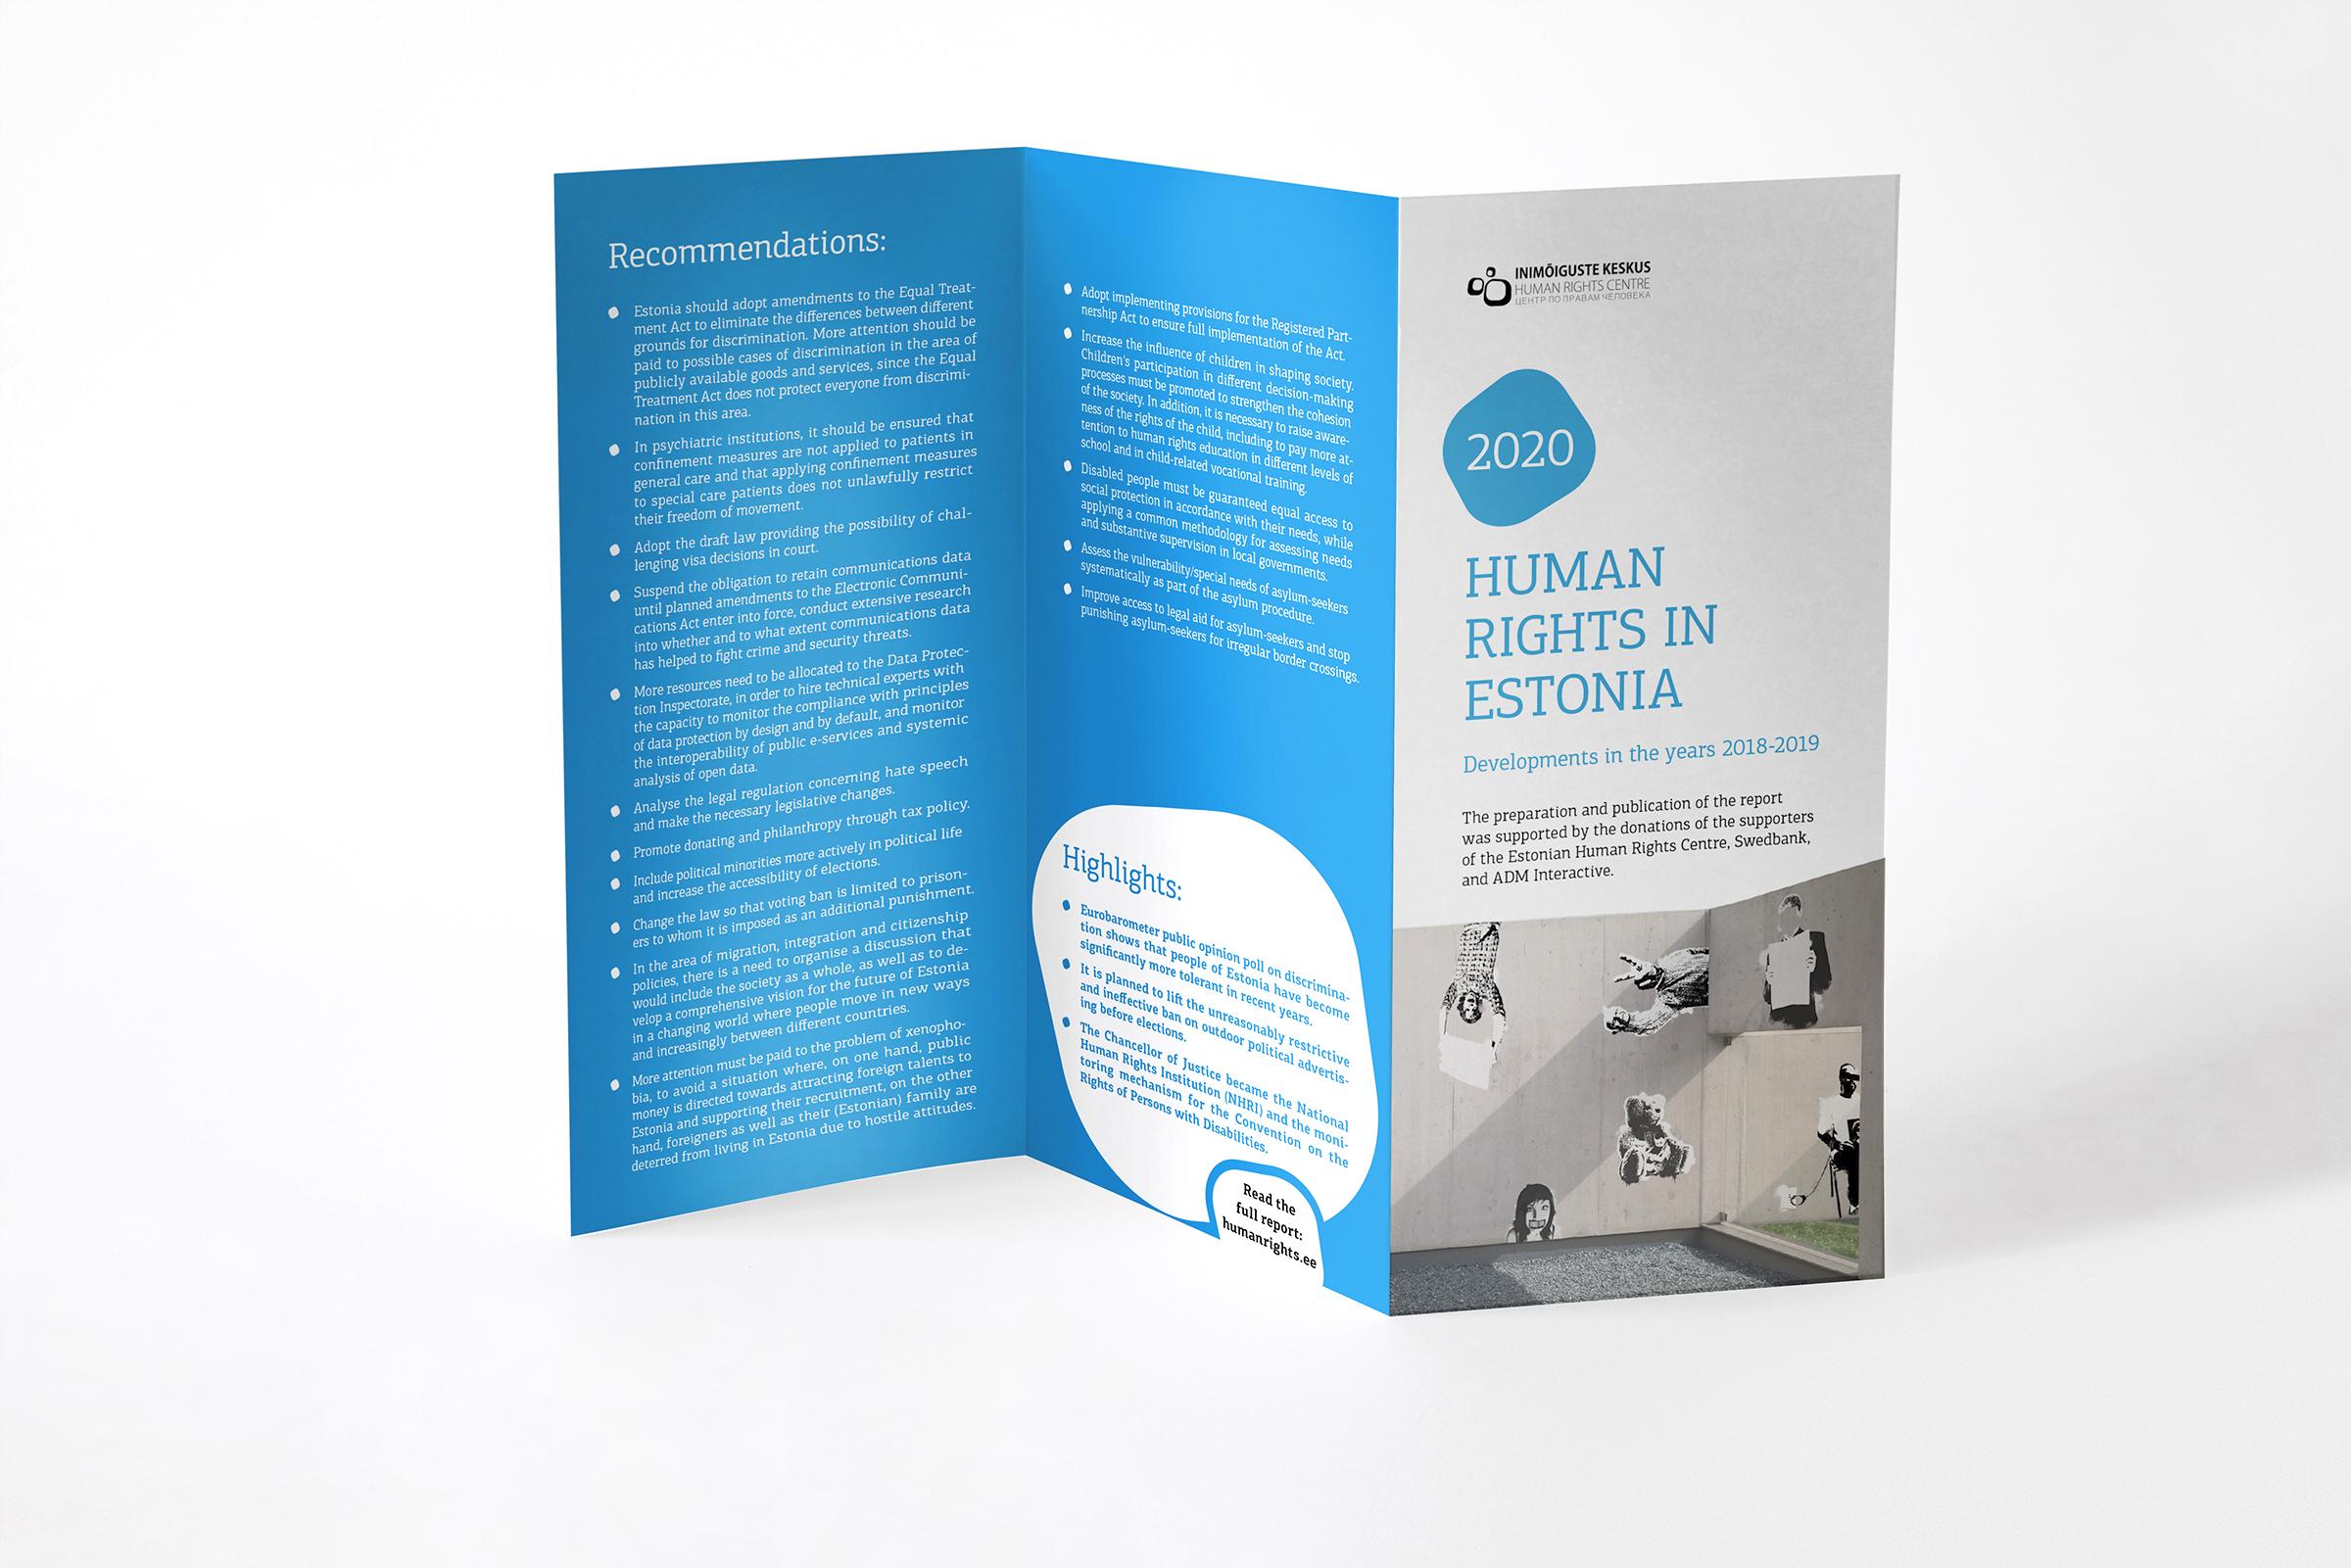 ESTONIA: 2020 Report on Human Rights